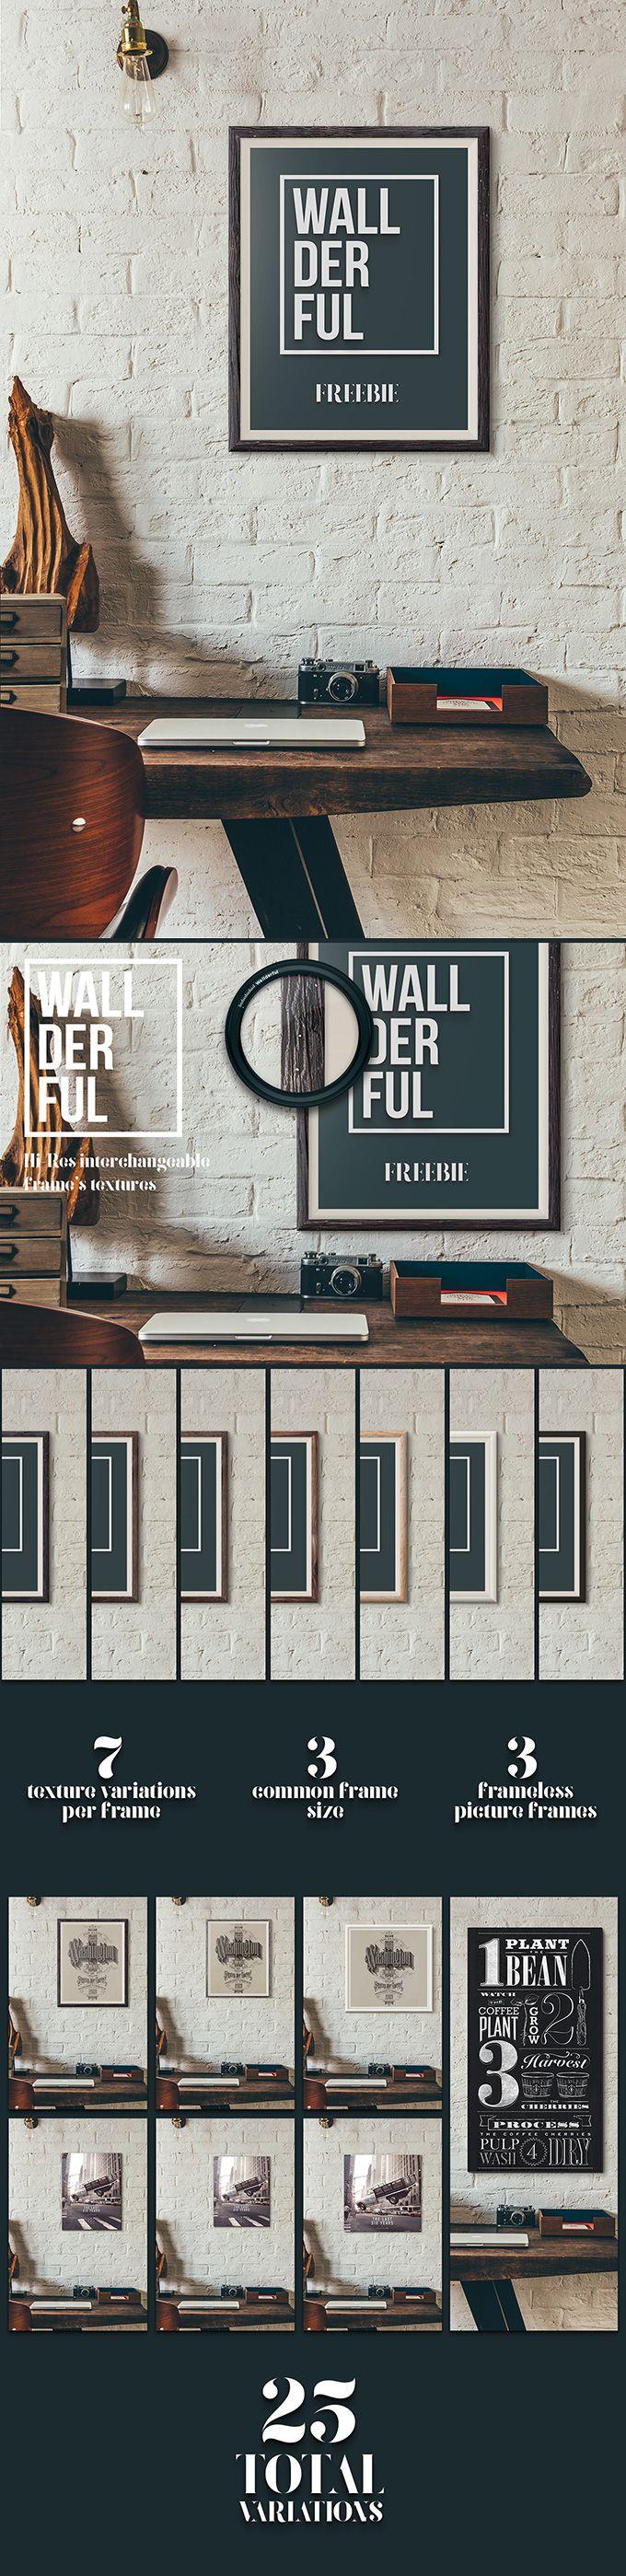 Wallderful: Free Frame Mockups (138 MB) | pixelbuddha.net